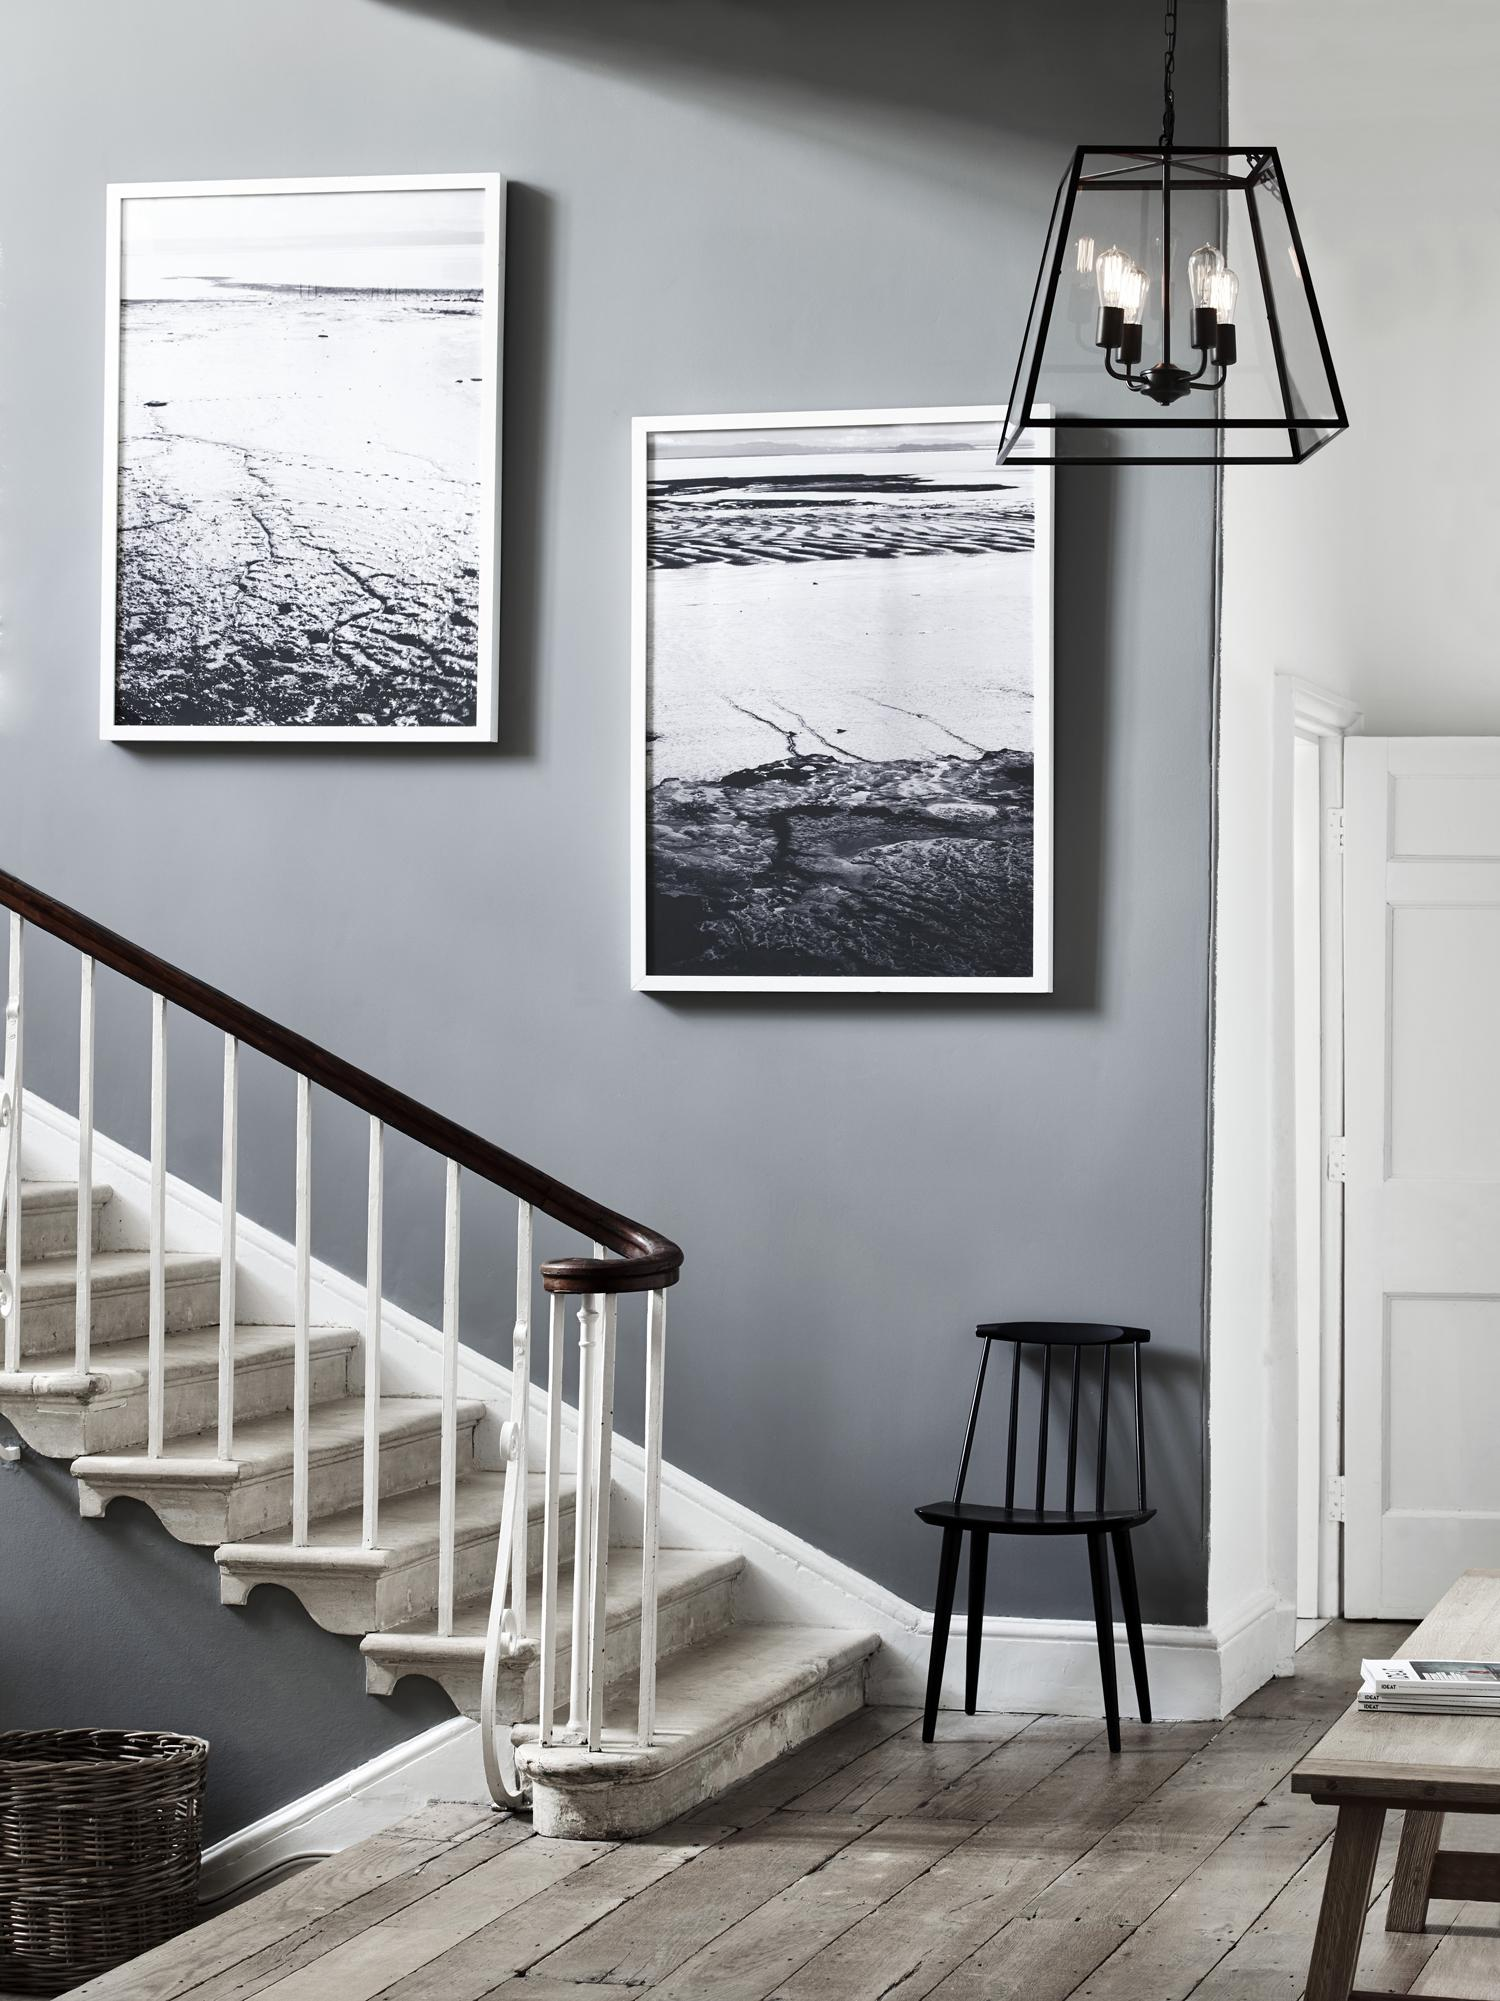 Wandgestaltung f r den flur bilder ideen couch for Treppenhaus grau